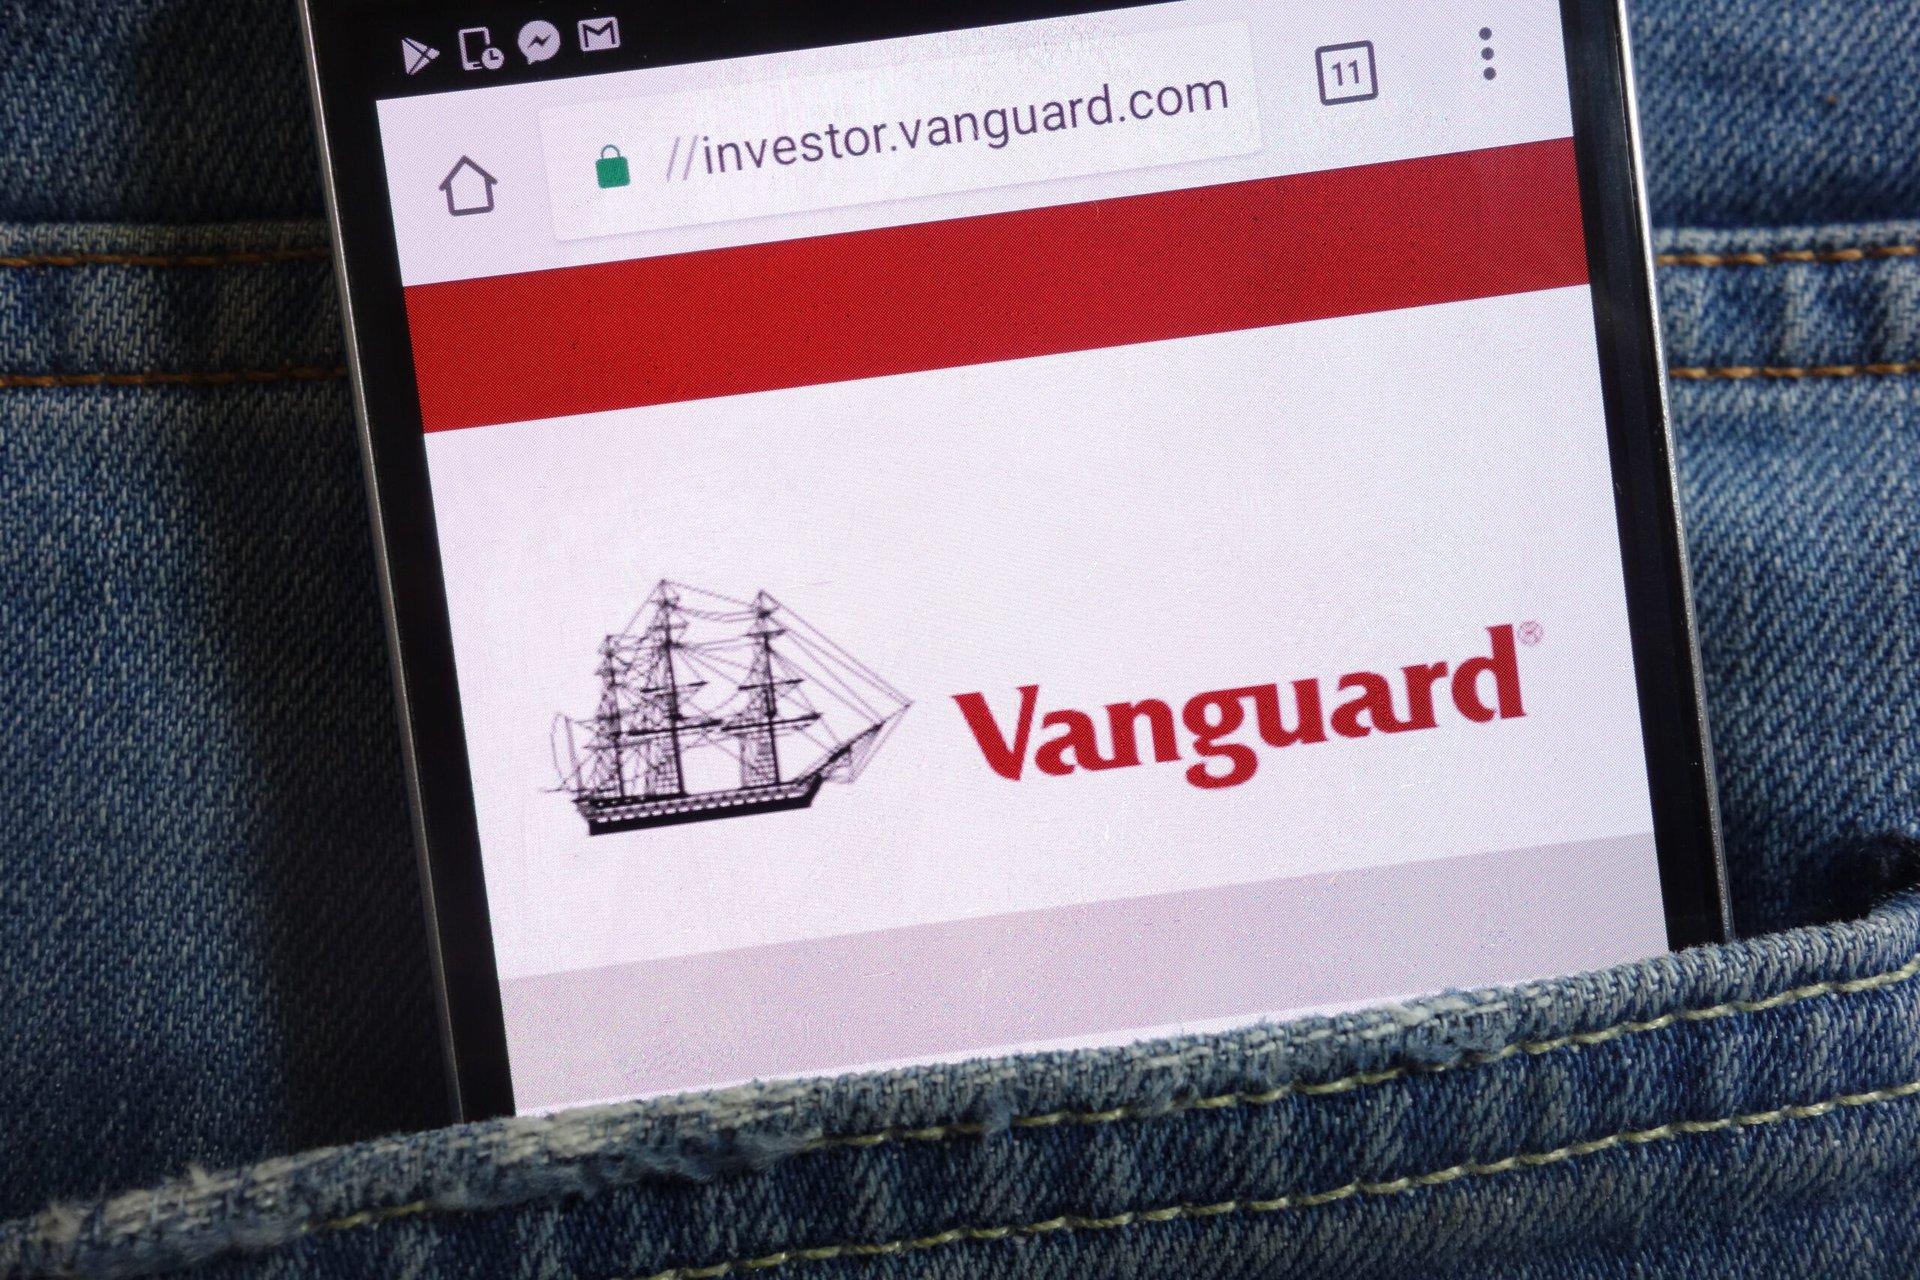 Vanguard Investments